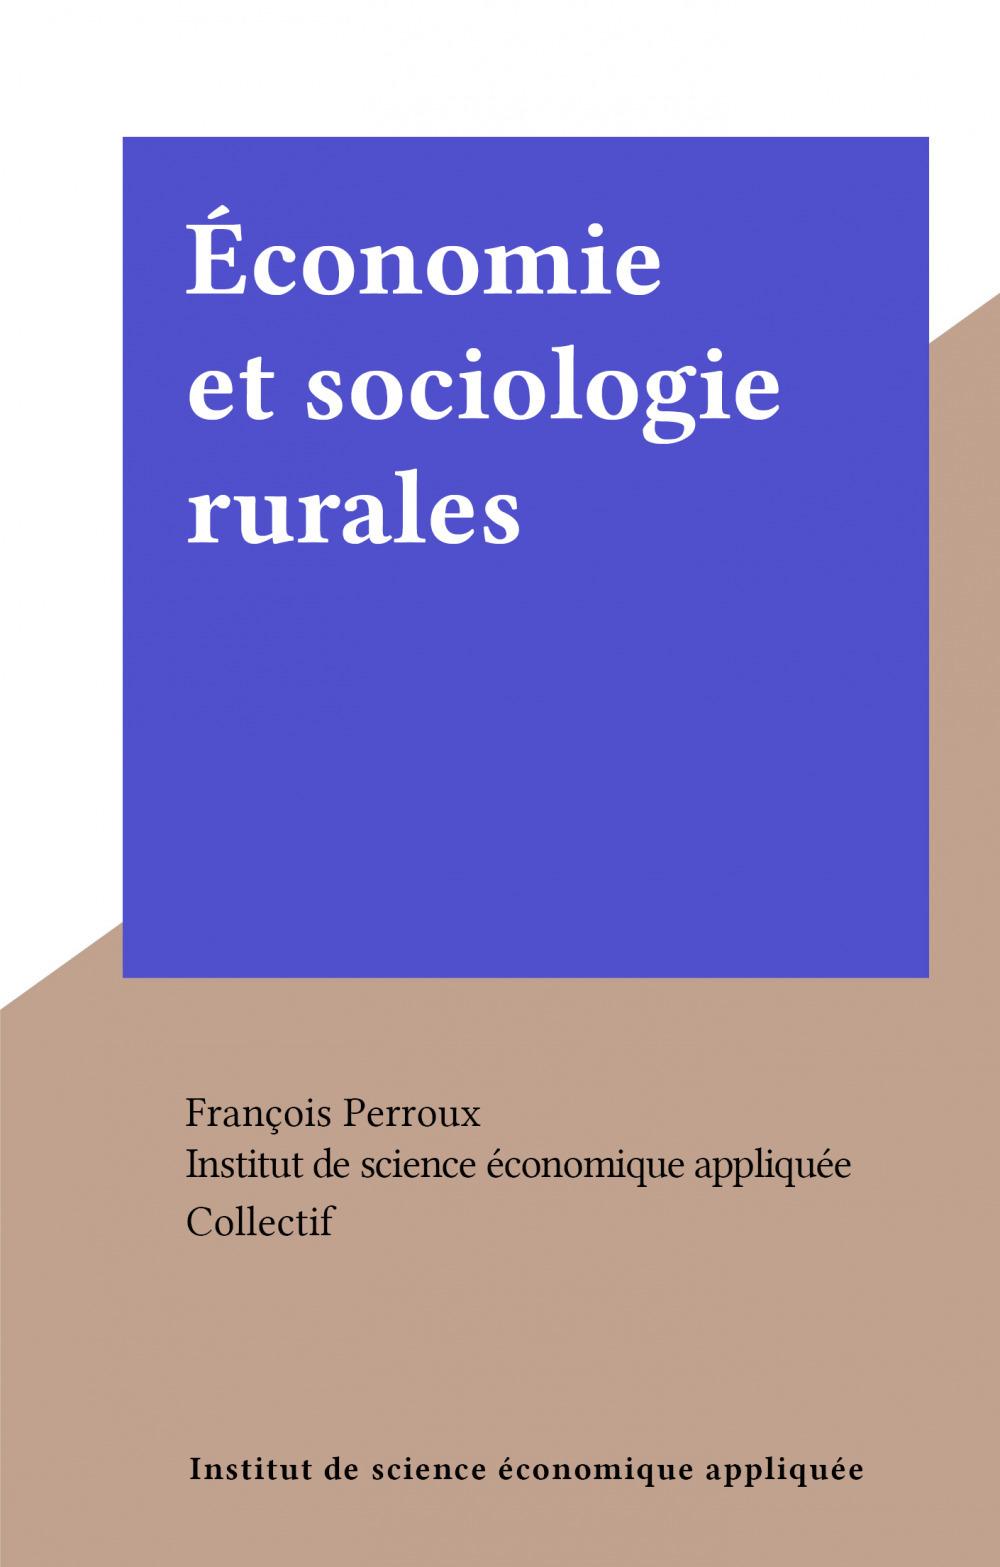 Économie et sociologie rurales